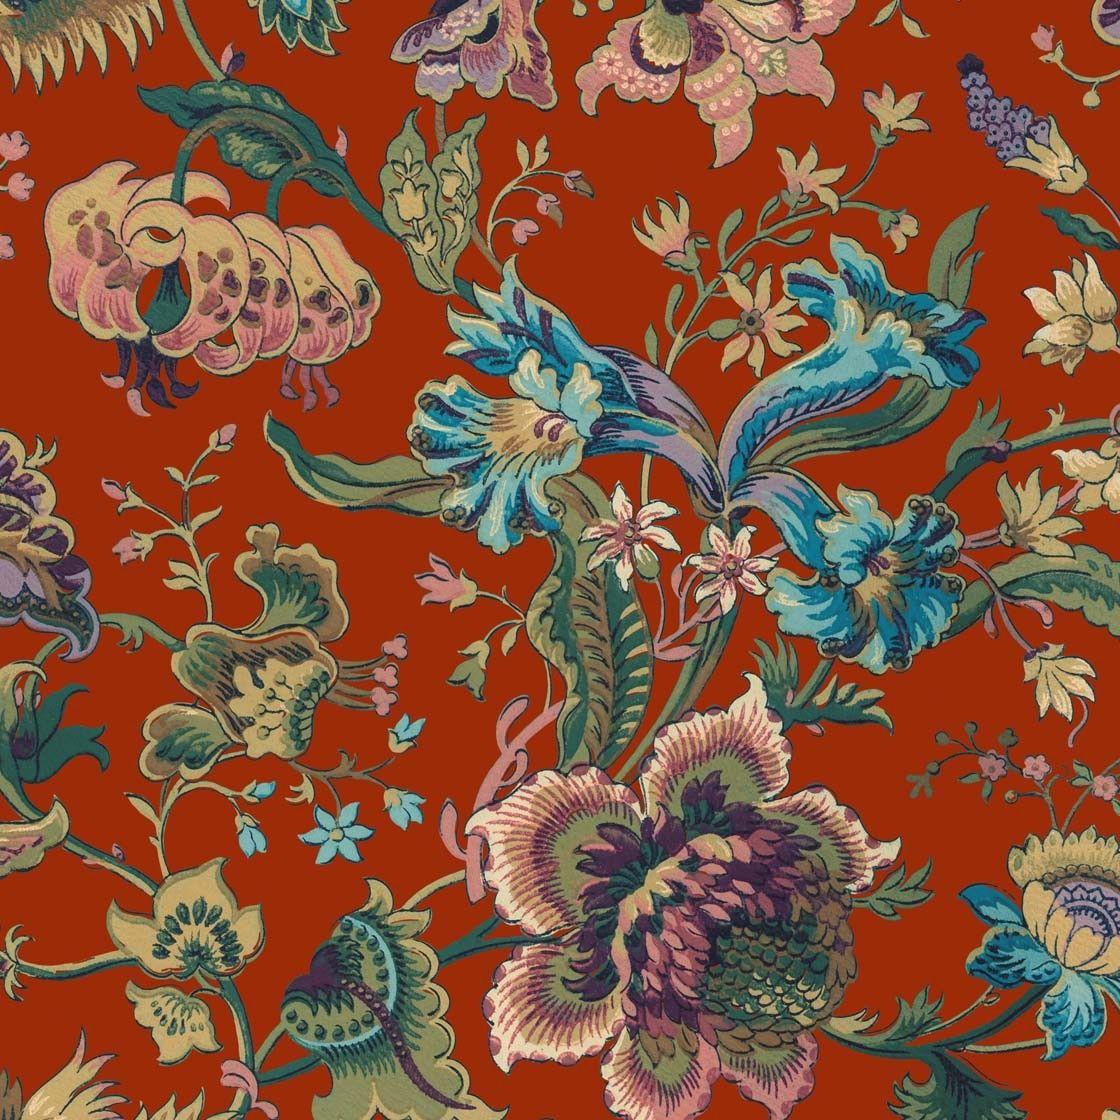 Interior Design Software: Wallpaper, Chinese Wallpaper